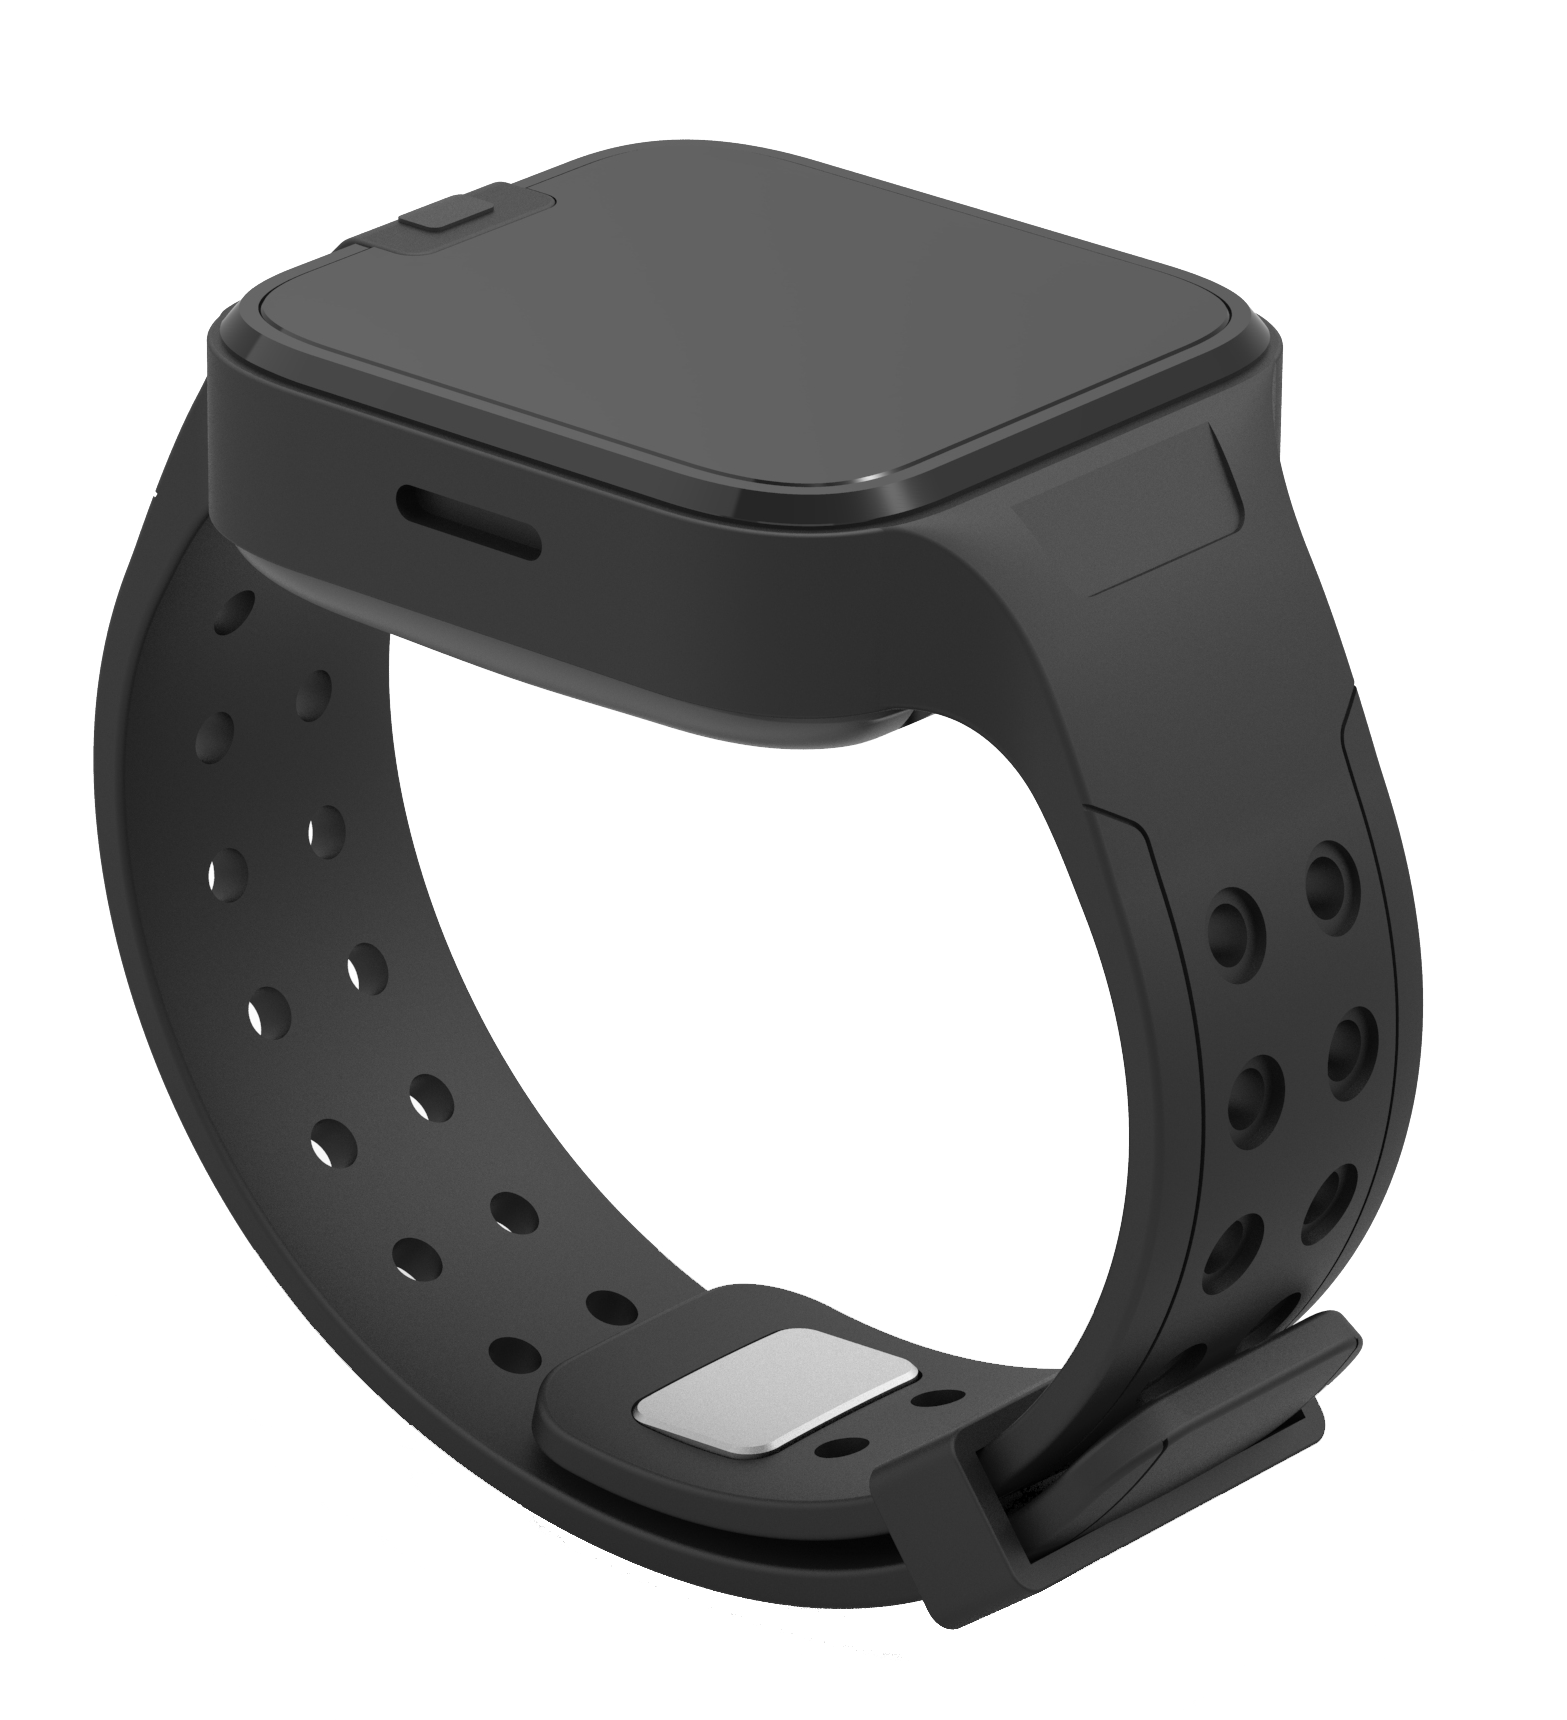 waterproof eddystone wearable personal locator iBeacon accelerometer sensor BLE proximity bluetooth beacon Bracelet  devices